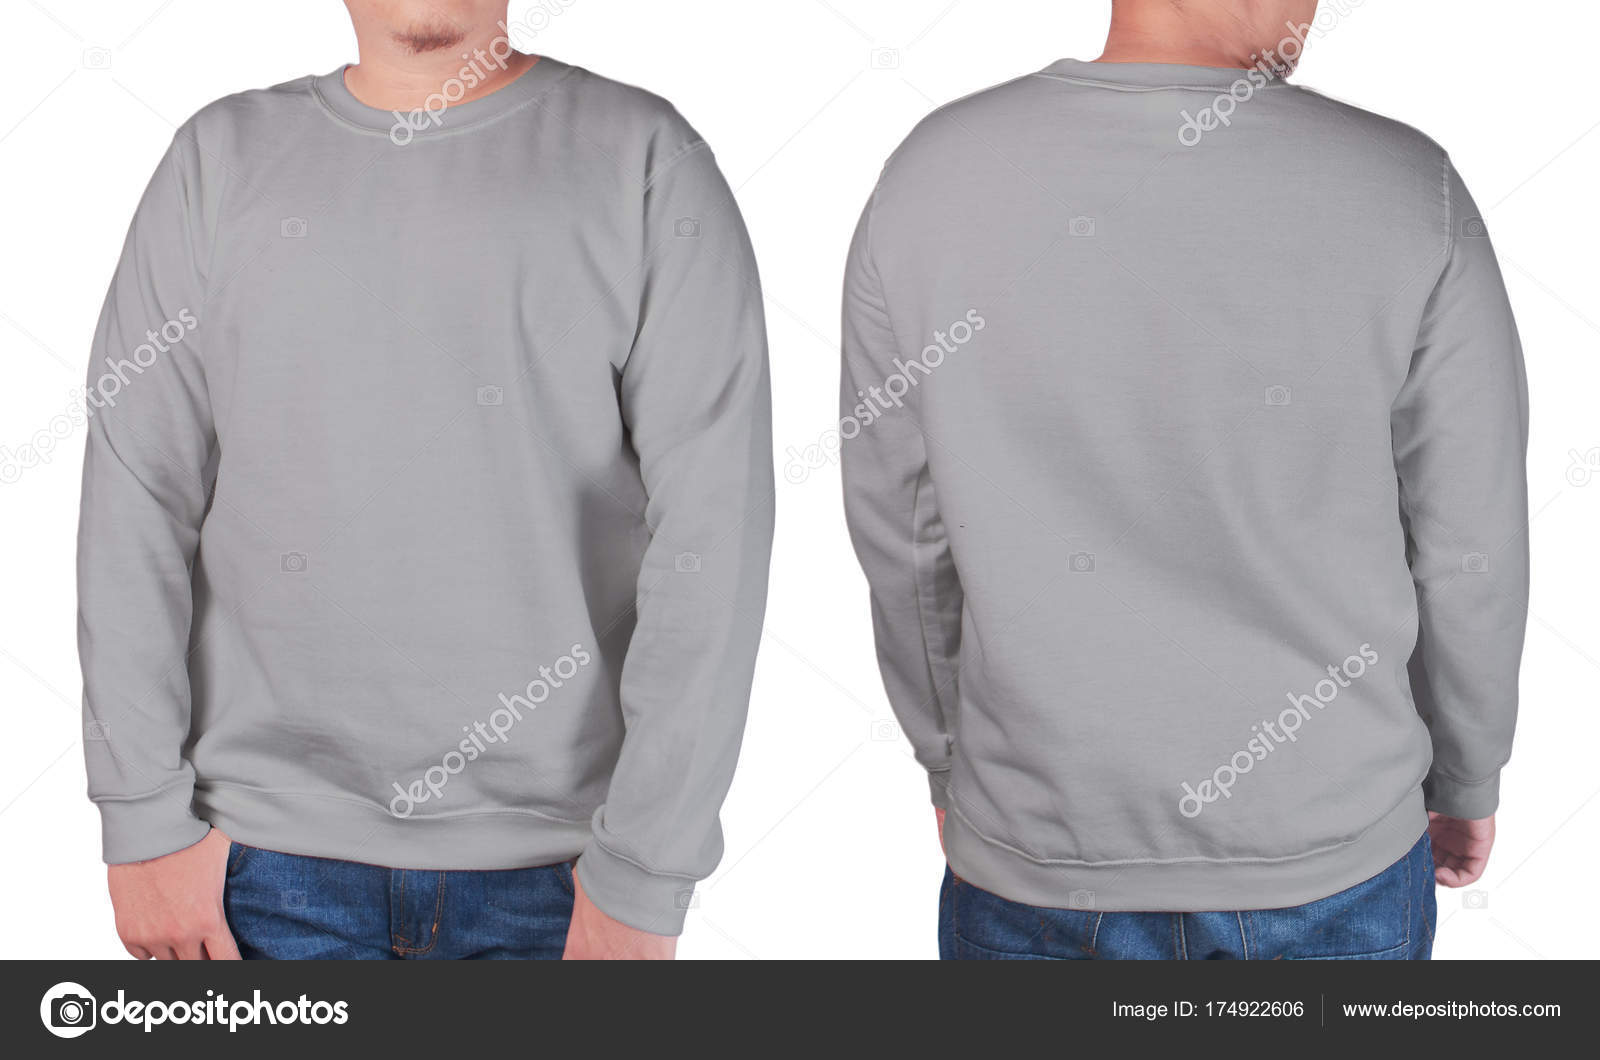 Lange Grijze Trui.Grijze Trui Lange Mouwen Shirt Mockup Sjabloon Stockfoto C Airdone